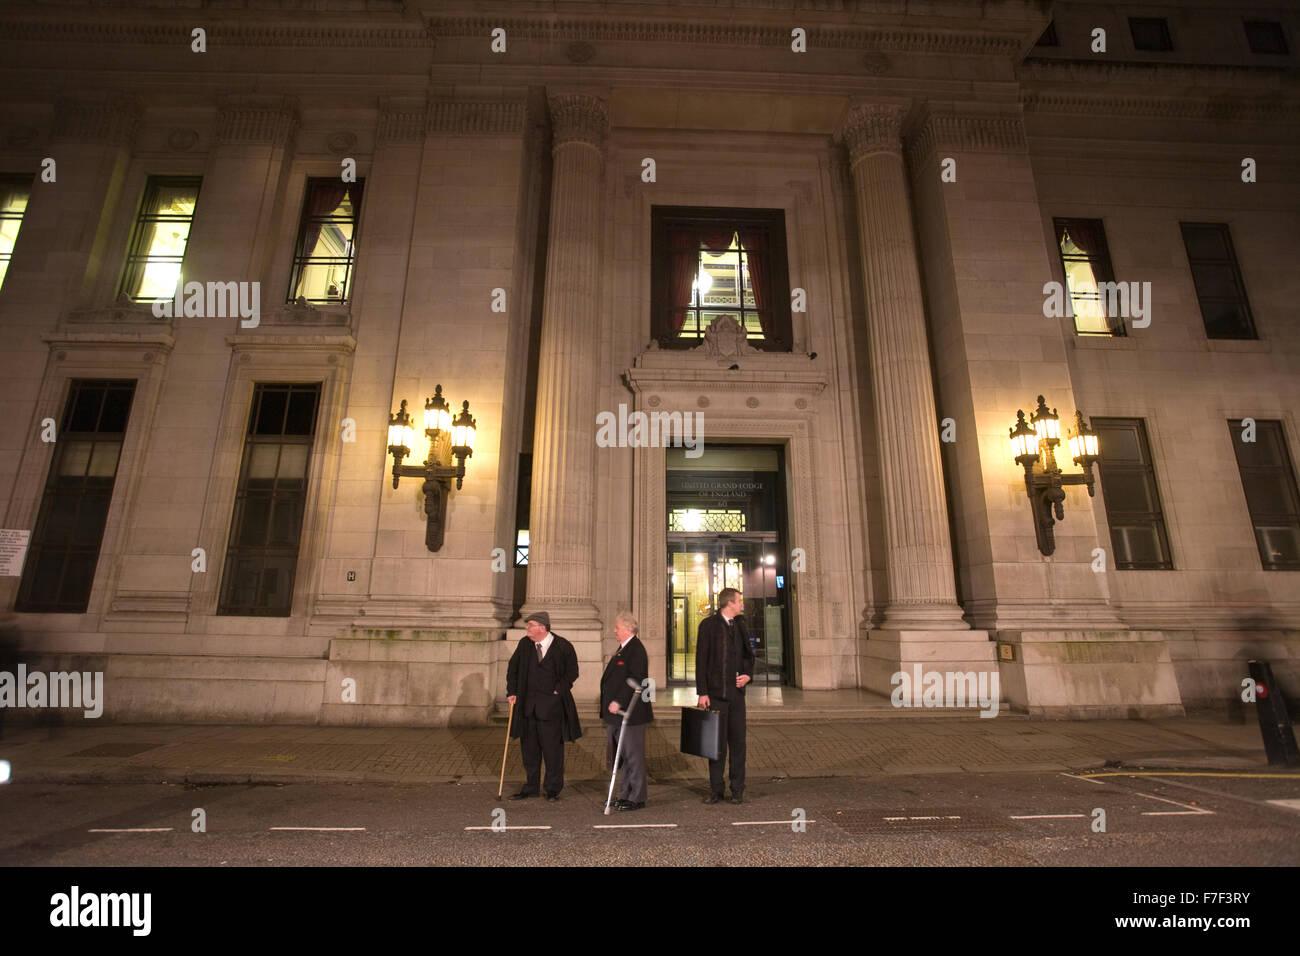 Freemason's Hall, United Grand Lodge, Masonic Lodge in London, England, United Kingdom - Stock Image